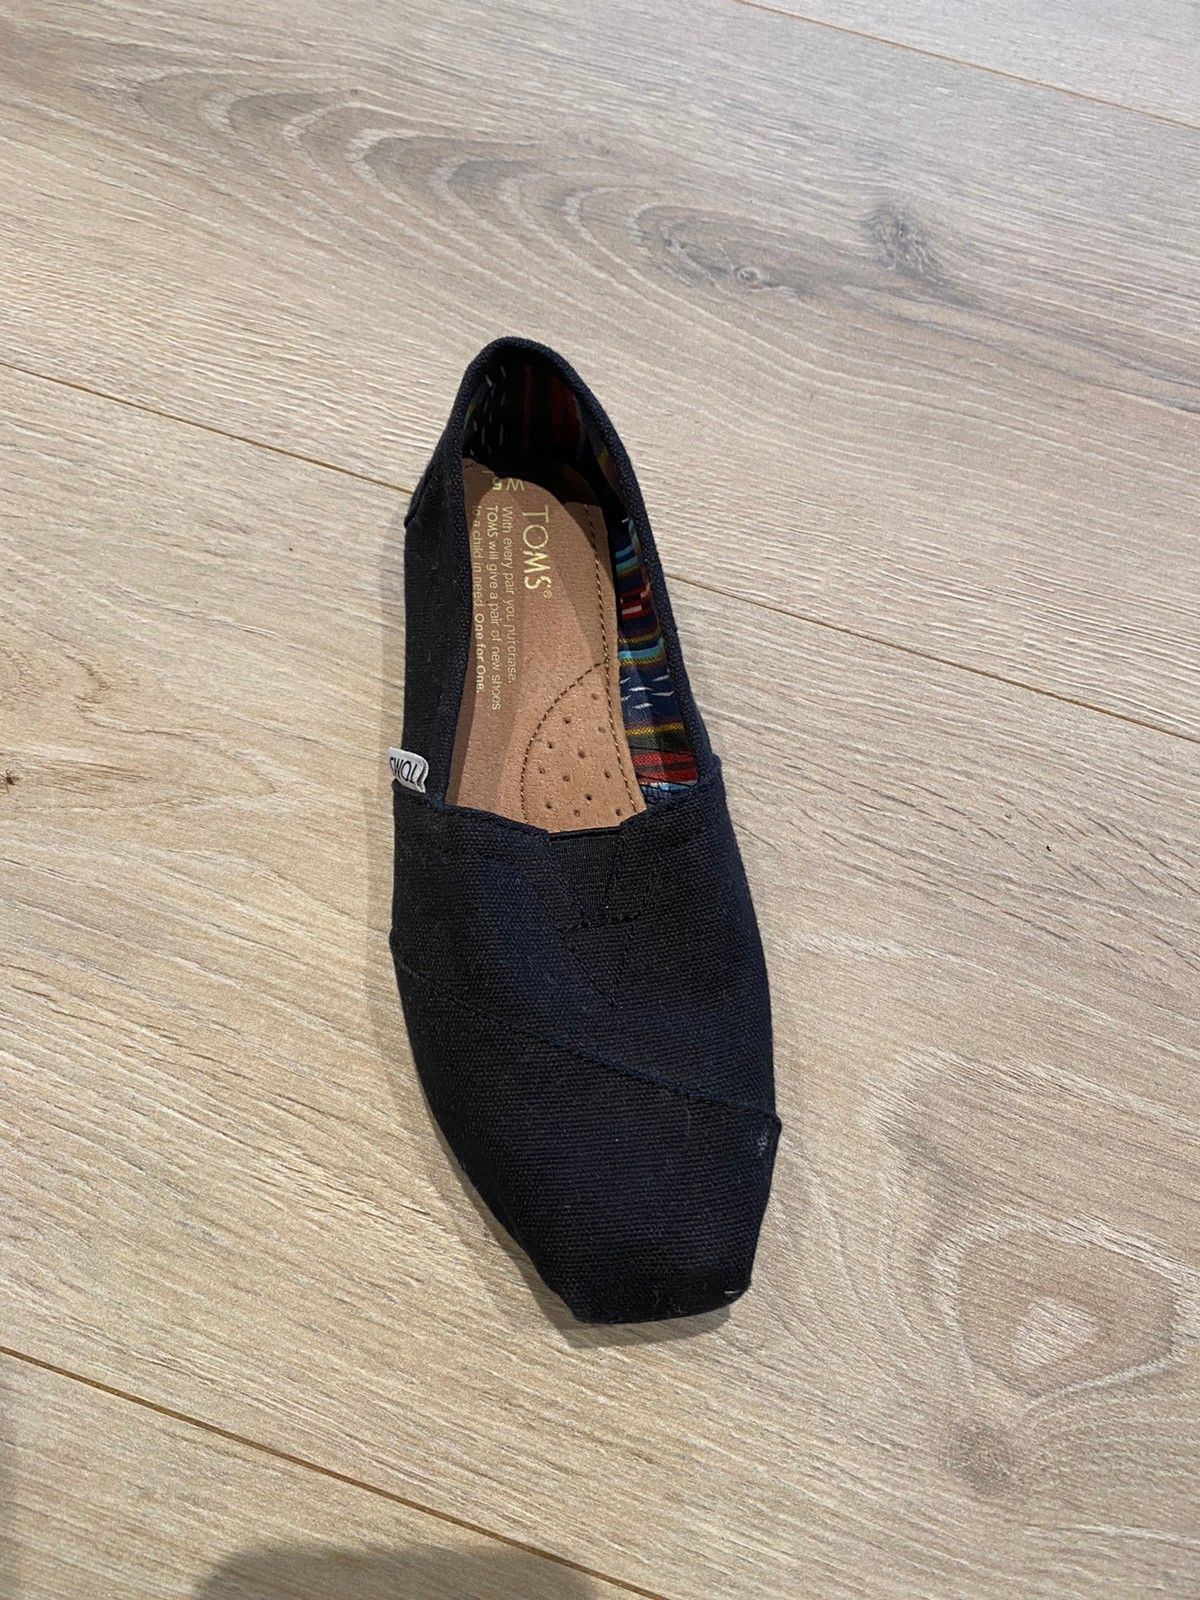 Ubrukte Toms sko str 39 | FINN.no